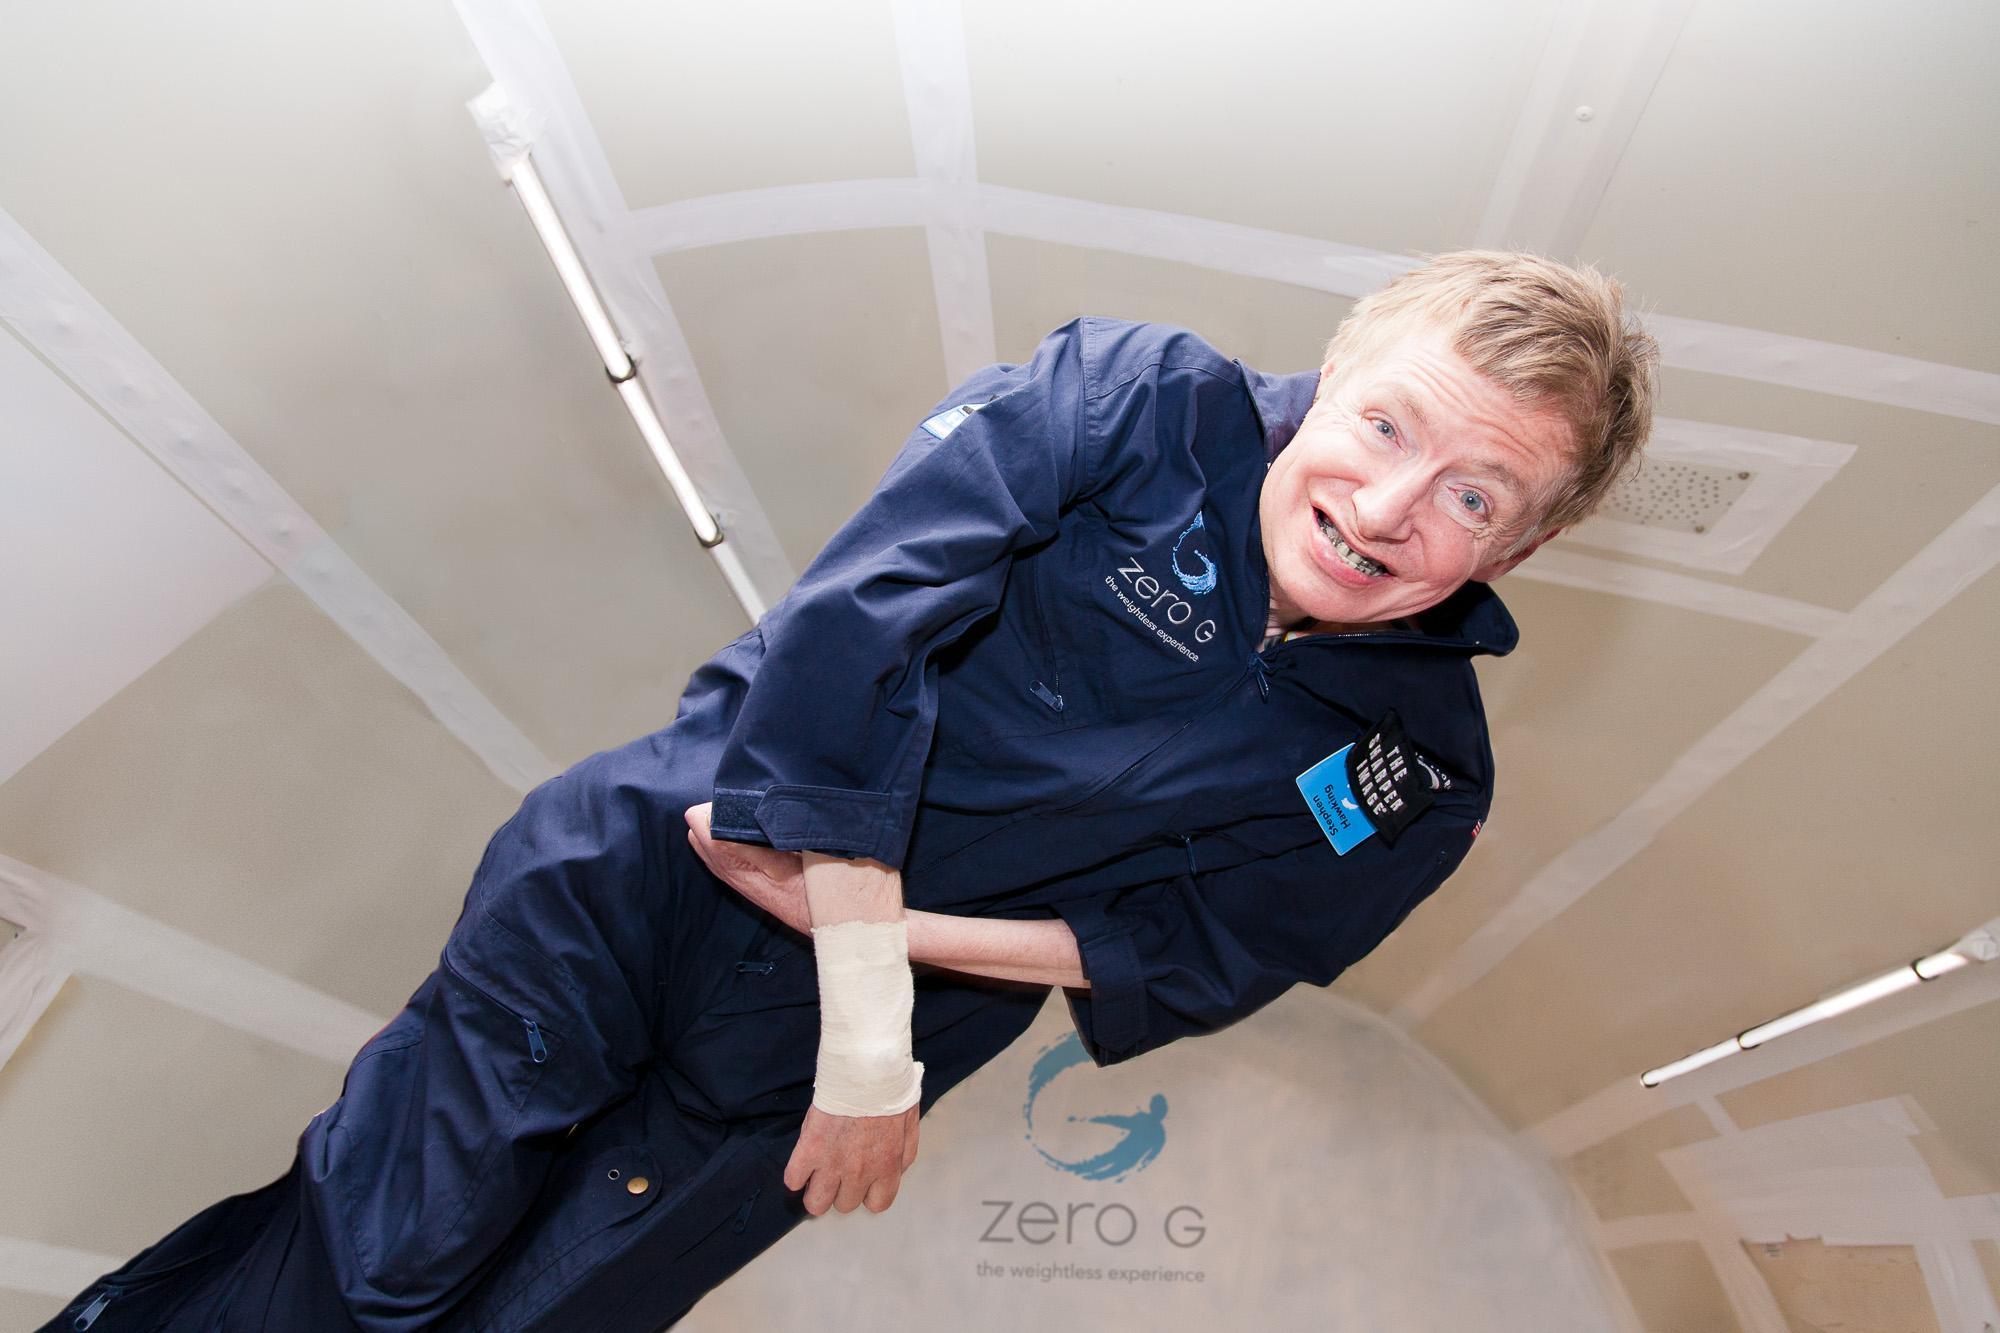 ZG104-Stephen-Hawking_steve-boxall-20070427_0188-Edit.jpg